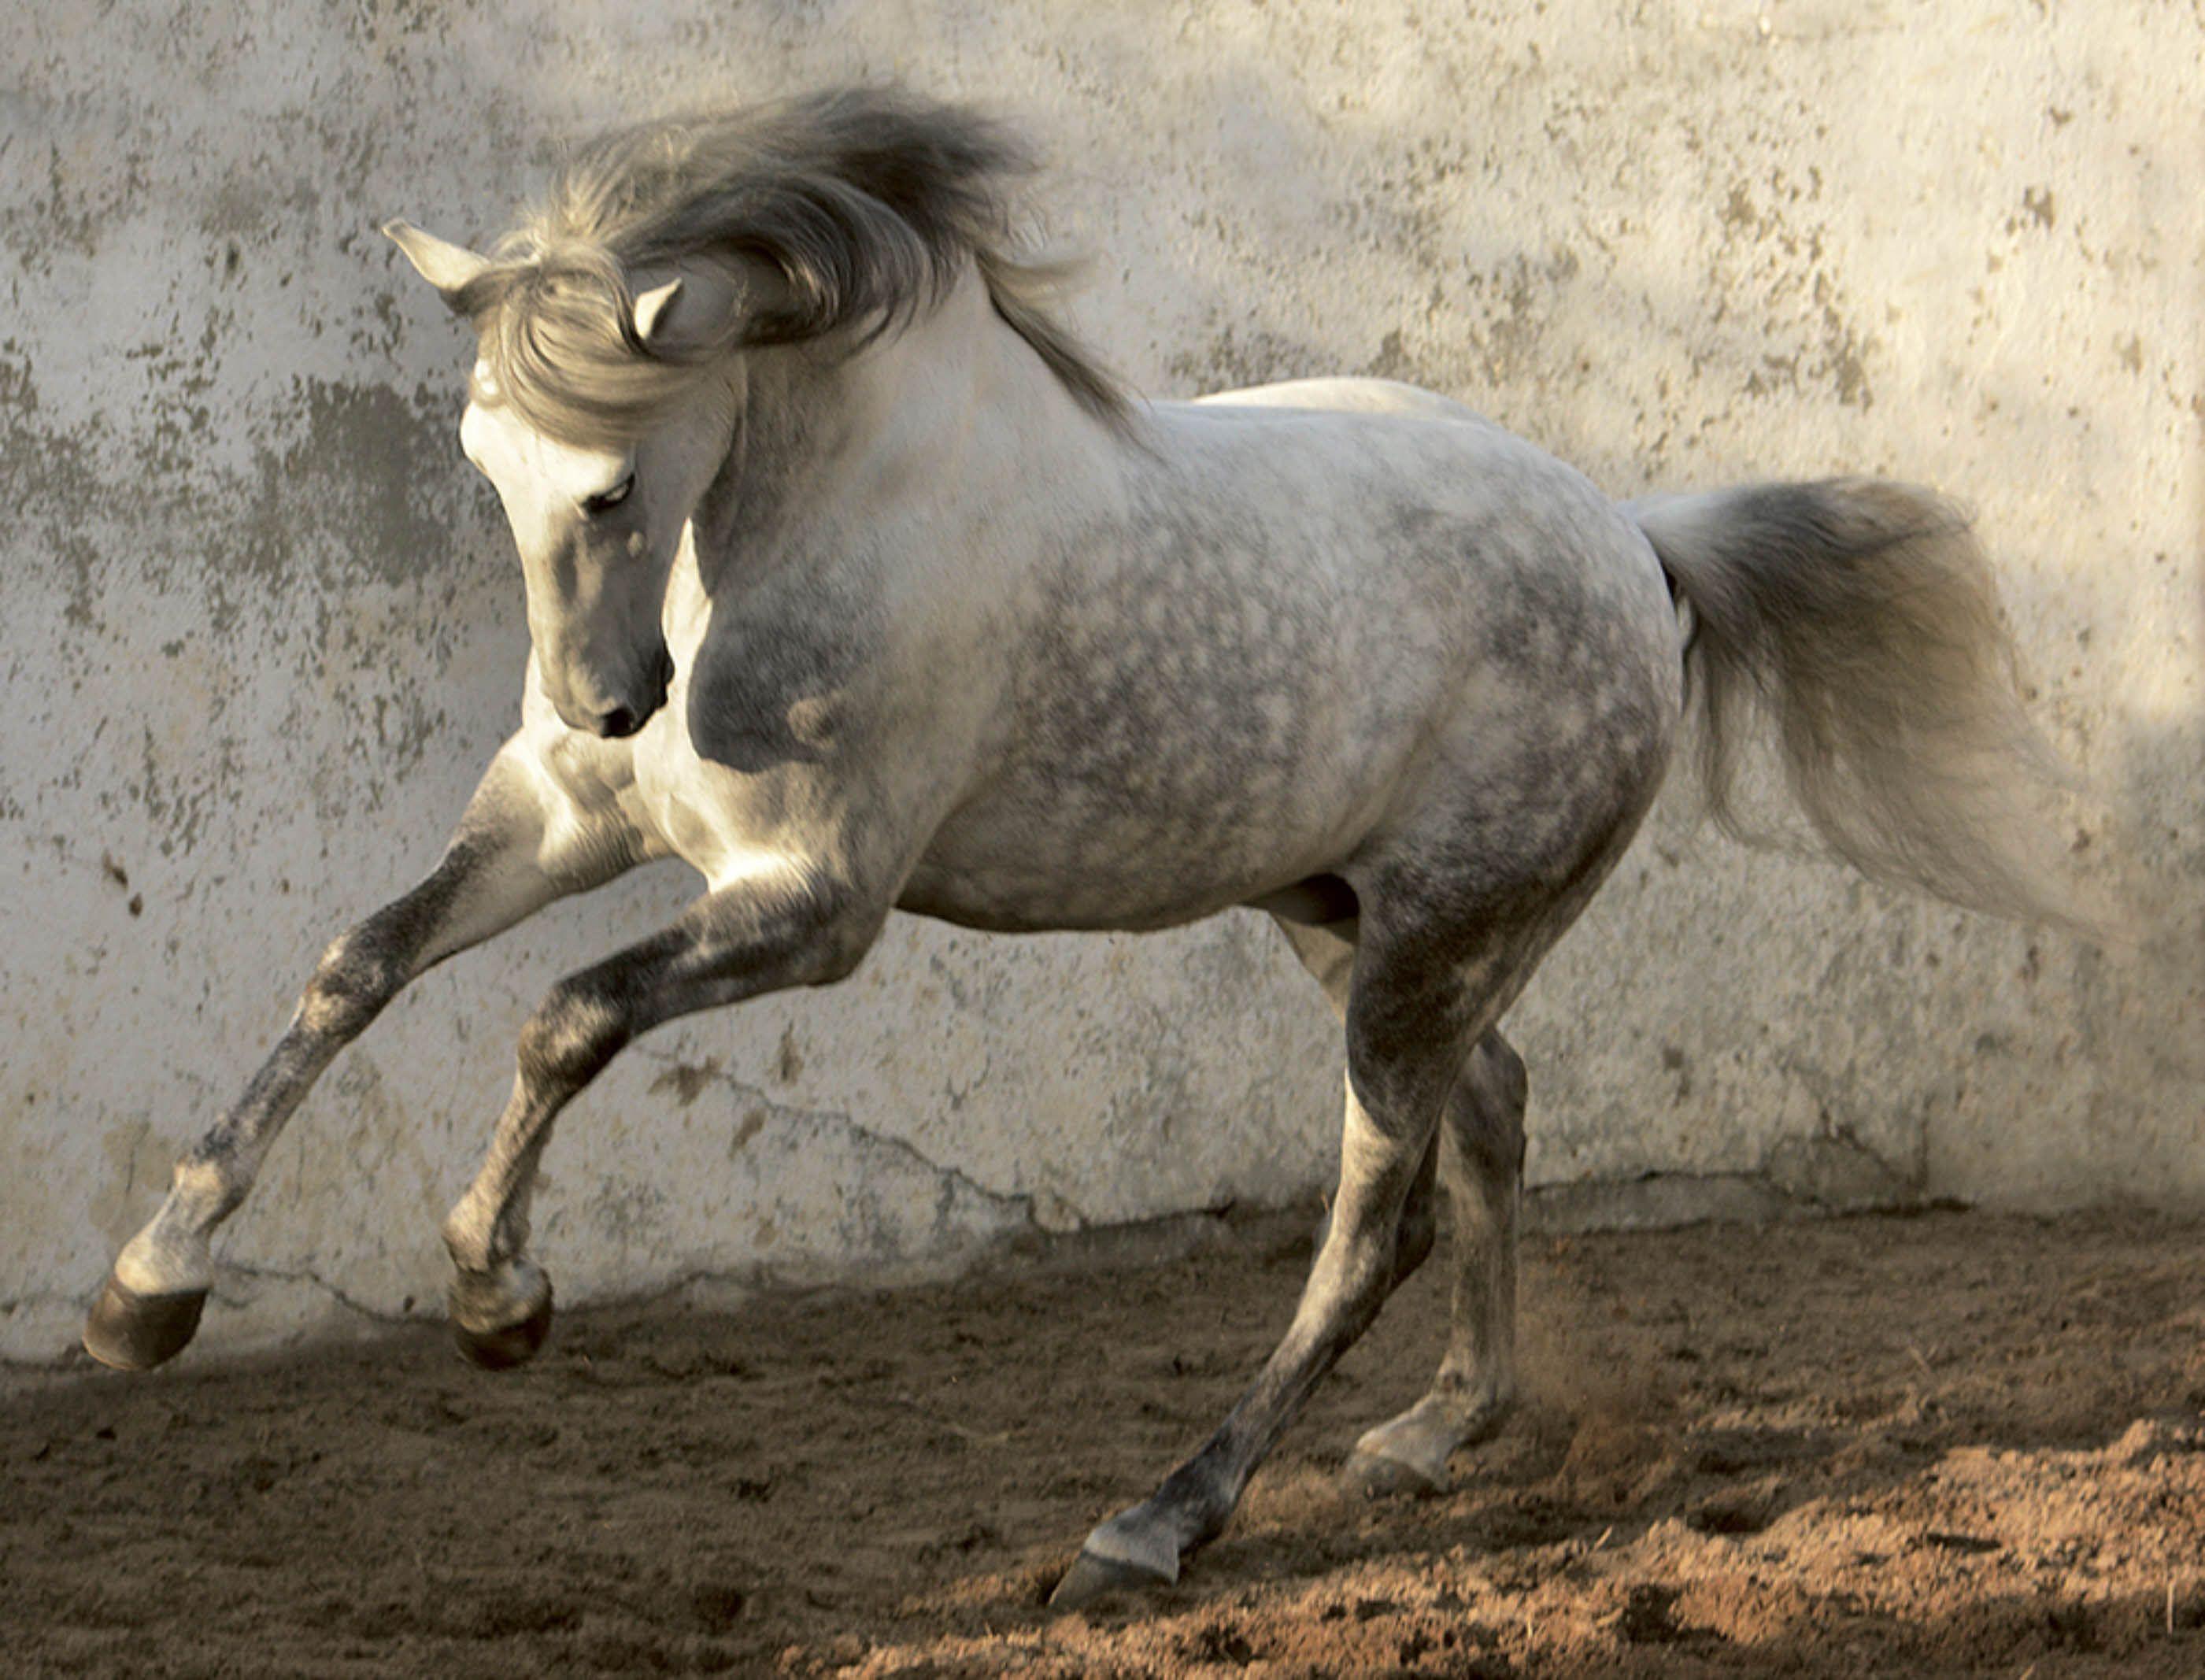 horses horse tony stromberg teneues action equine powerful stallion incredible strength wanderlust books grey around portugal riding animals lusitano bad